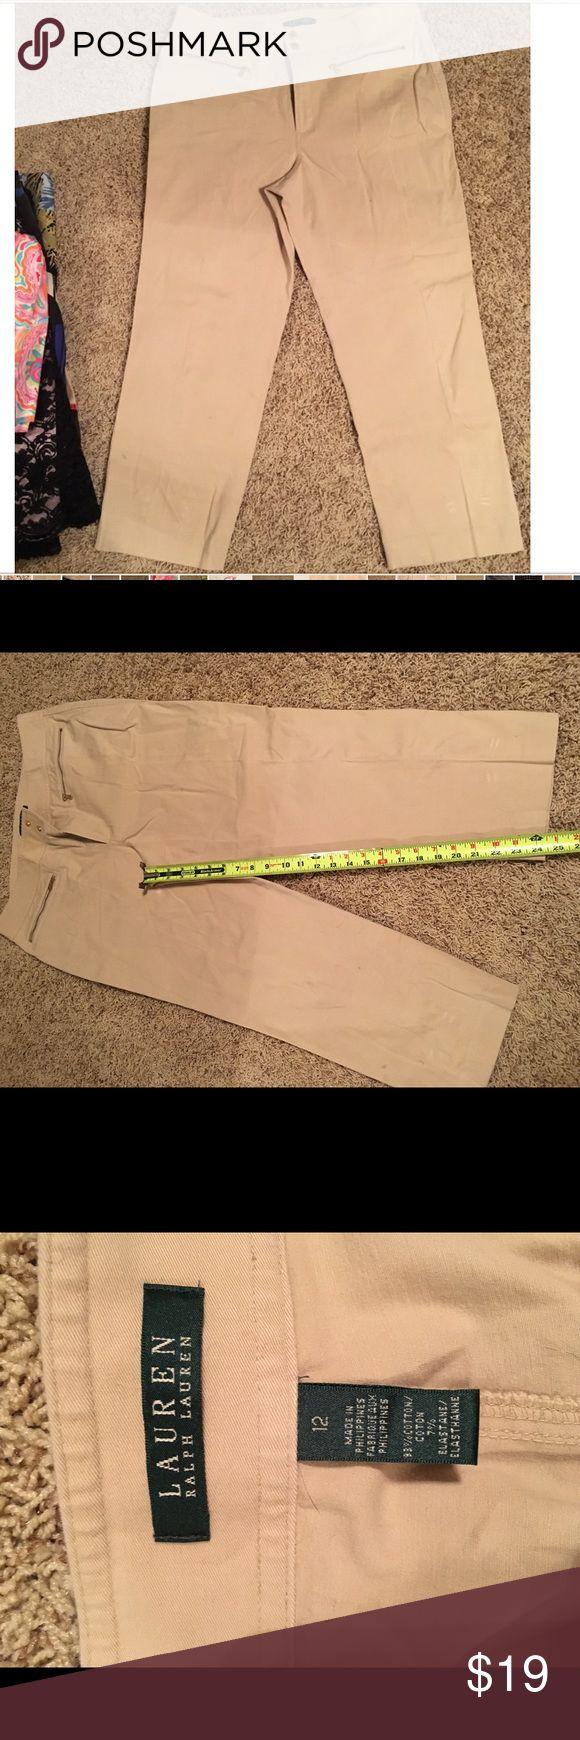 Lauren Ralph Lauren chino Khaki 12 capris Cotton chino size 12 Capris khaki pants. Ralph Lauren Ralph Lauren Pants Capris